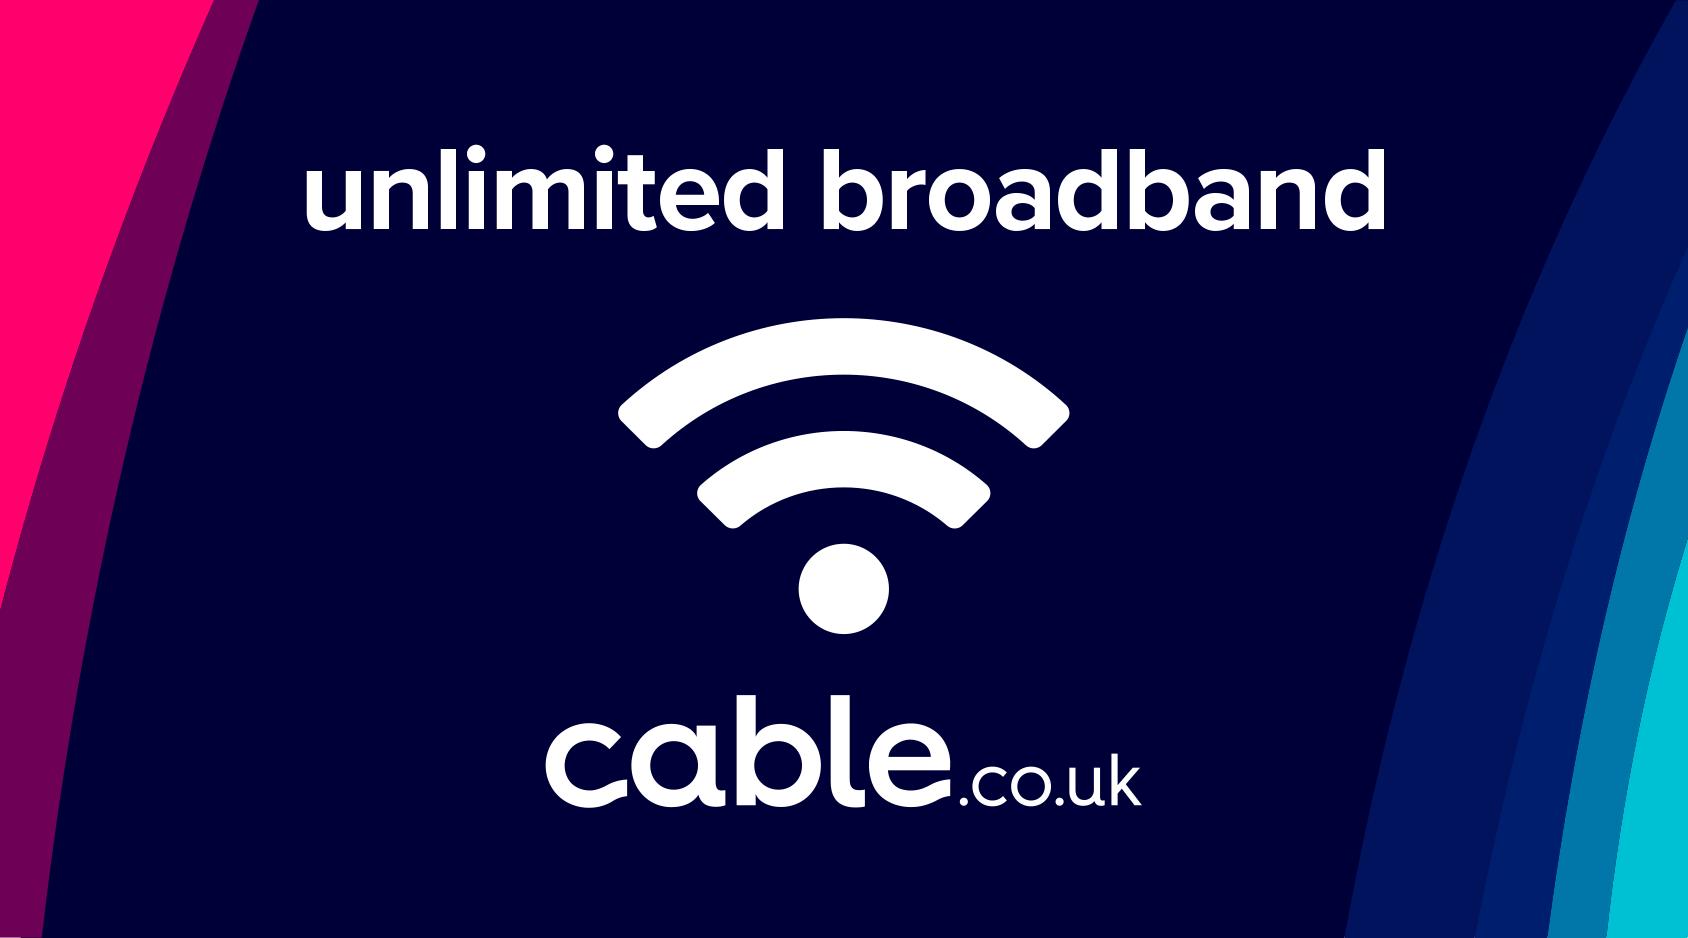 Unlimited broadband deals – Cable.co.uk